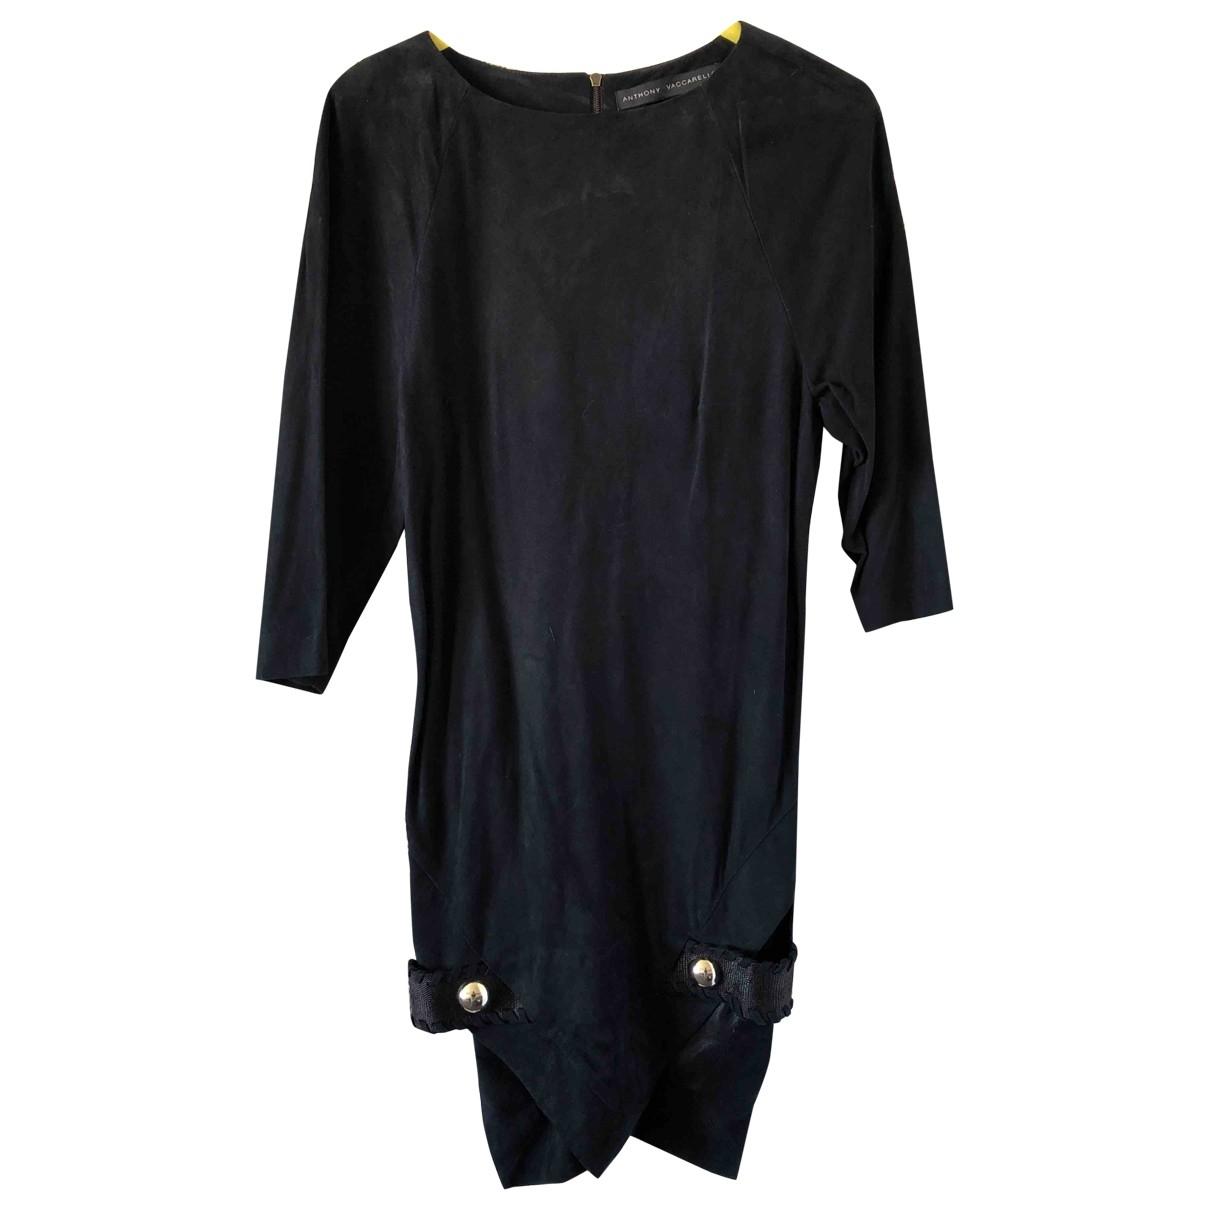 Anthony Vaccarello \N Kleid in  Schwarz Veloursleder